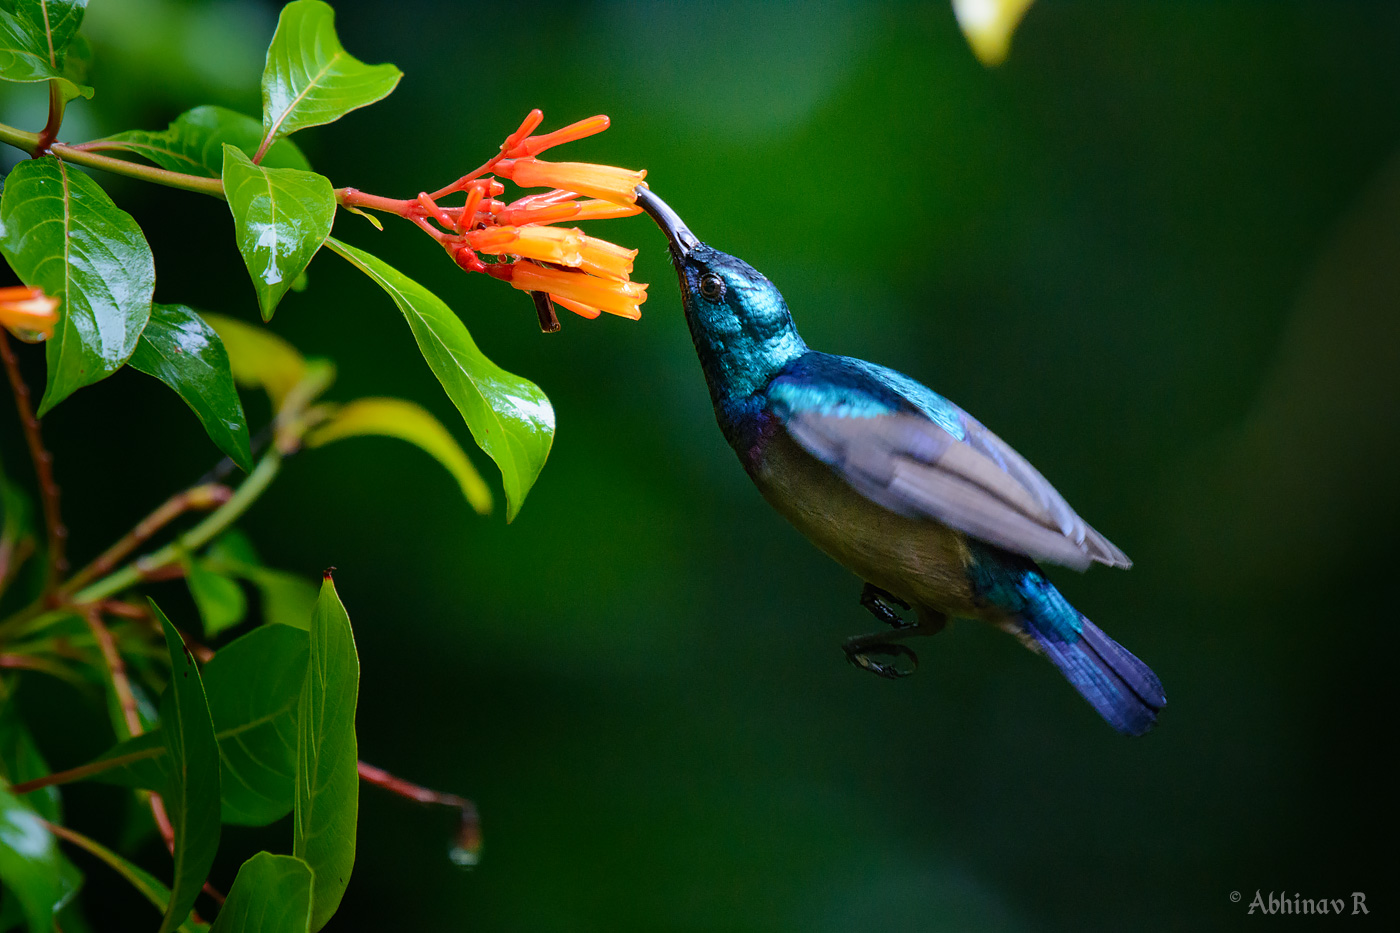 How to photograph Sunbird in Flight - Loten's Sunbird